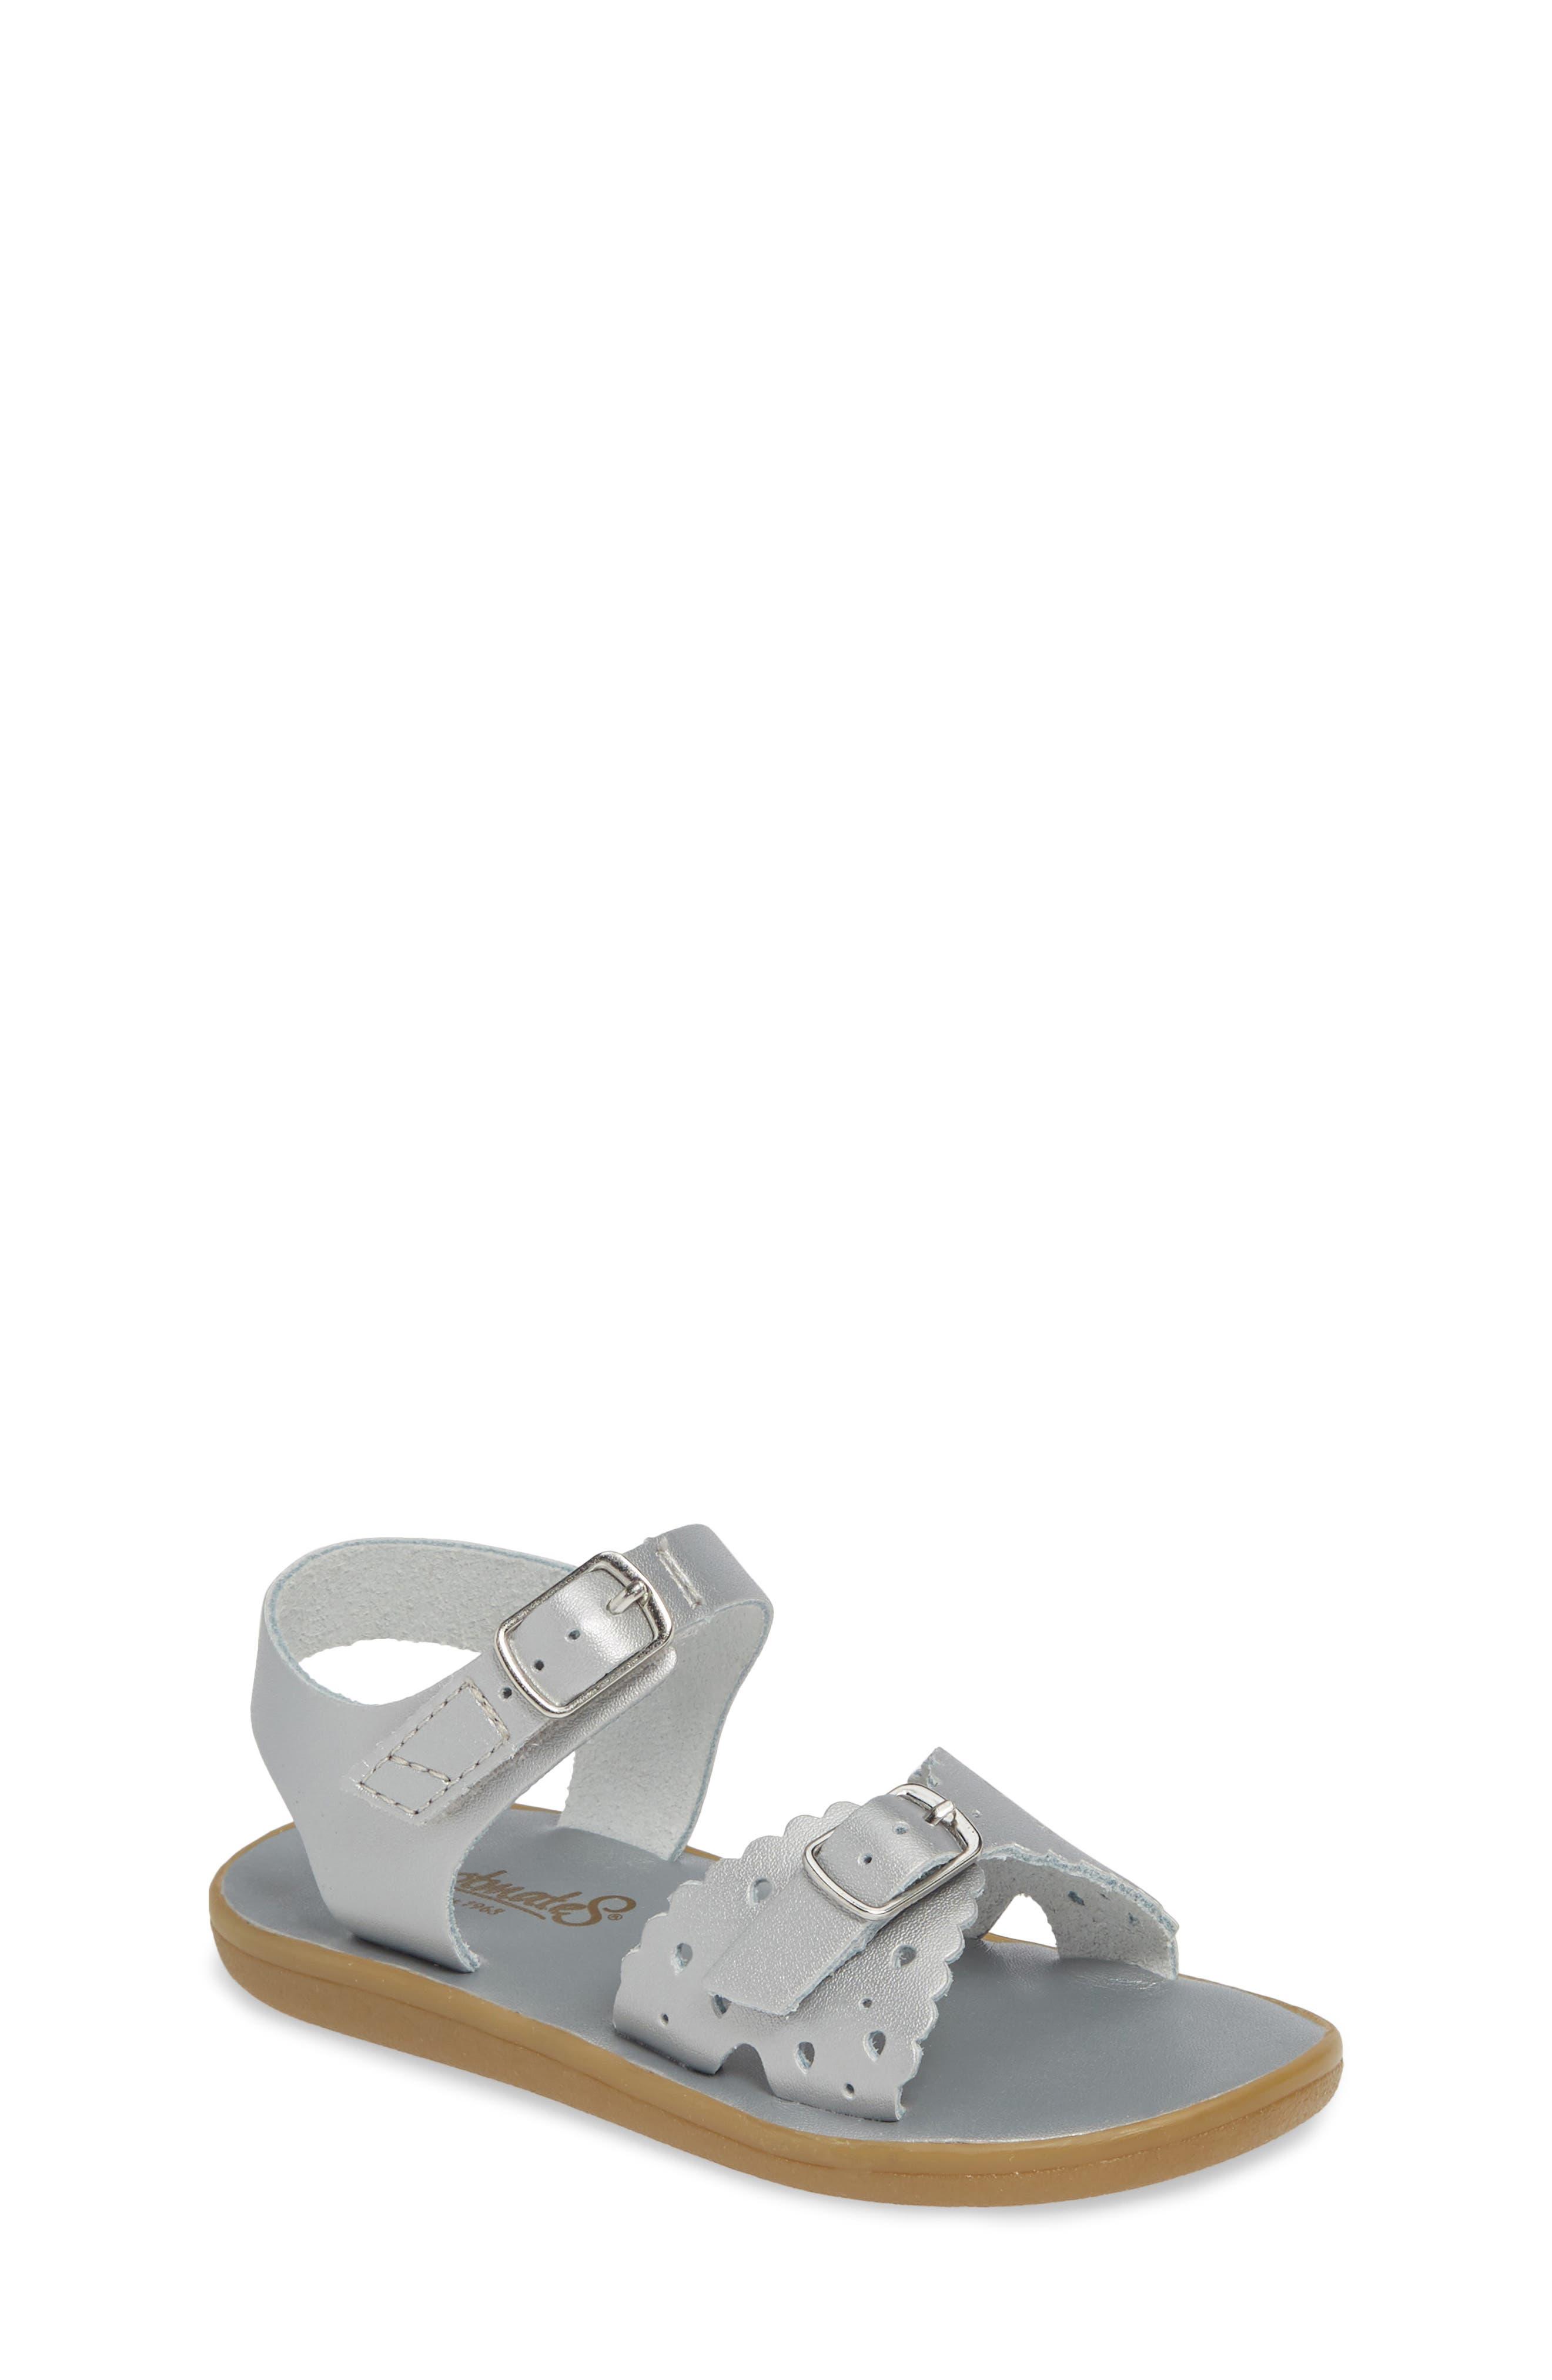 FOOTMATES,                             Arie Waterproof Sandal,                             Main thumbnail 1, color,                             SILVER